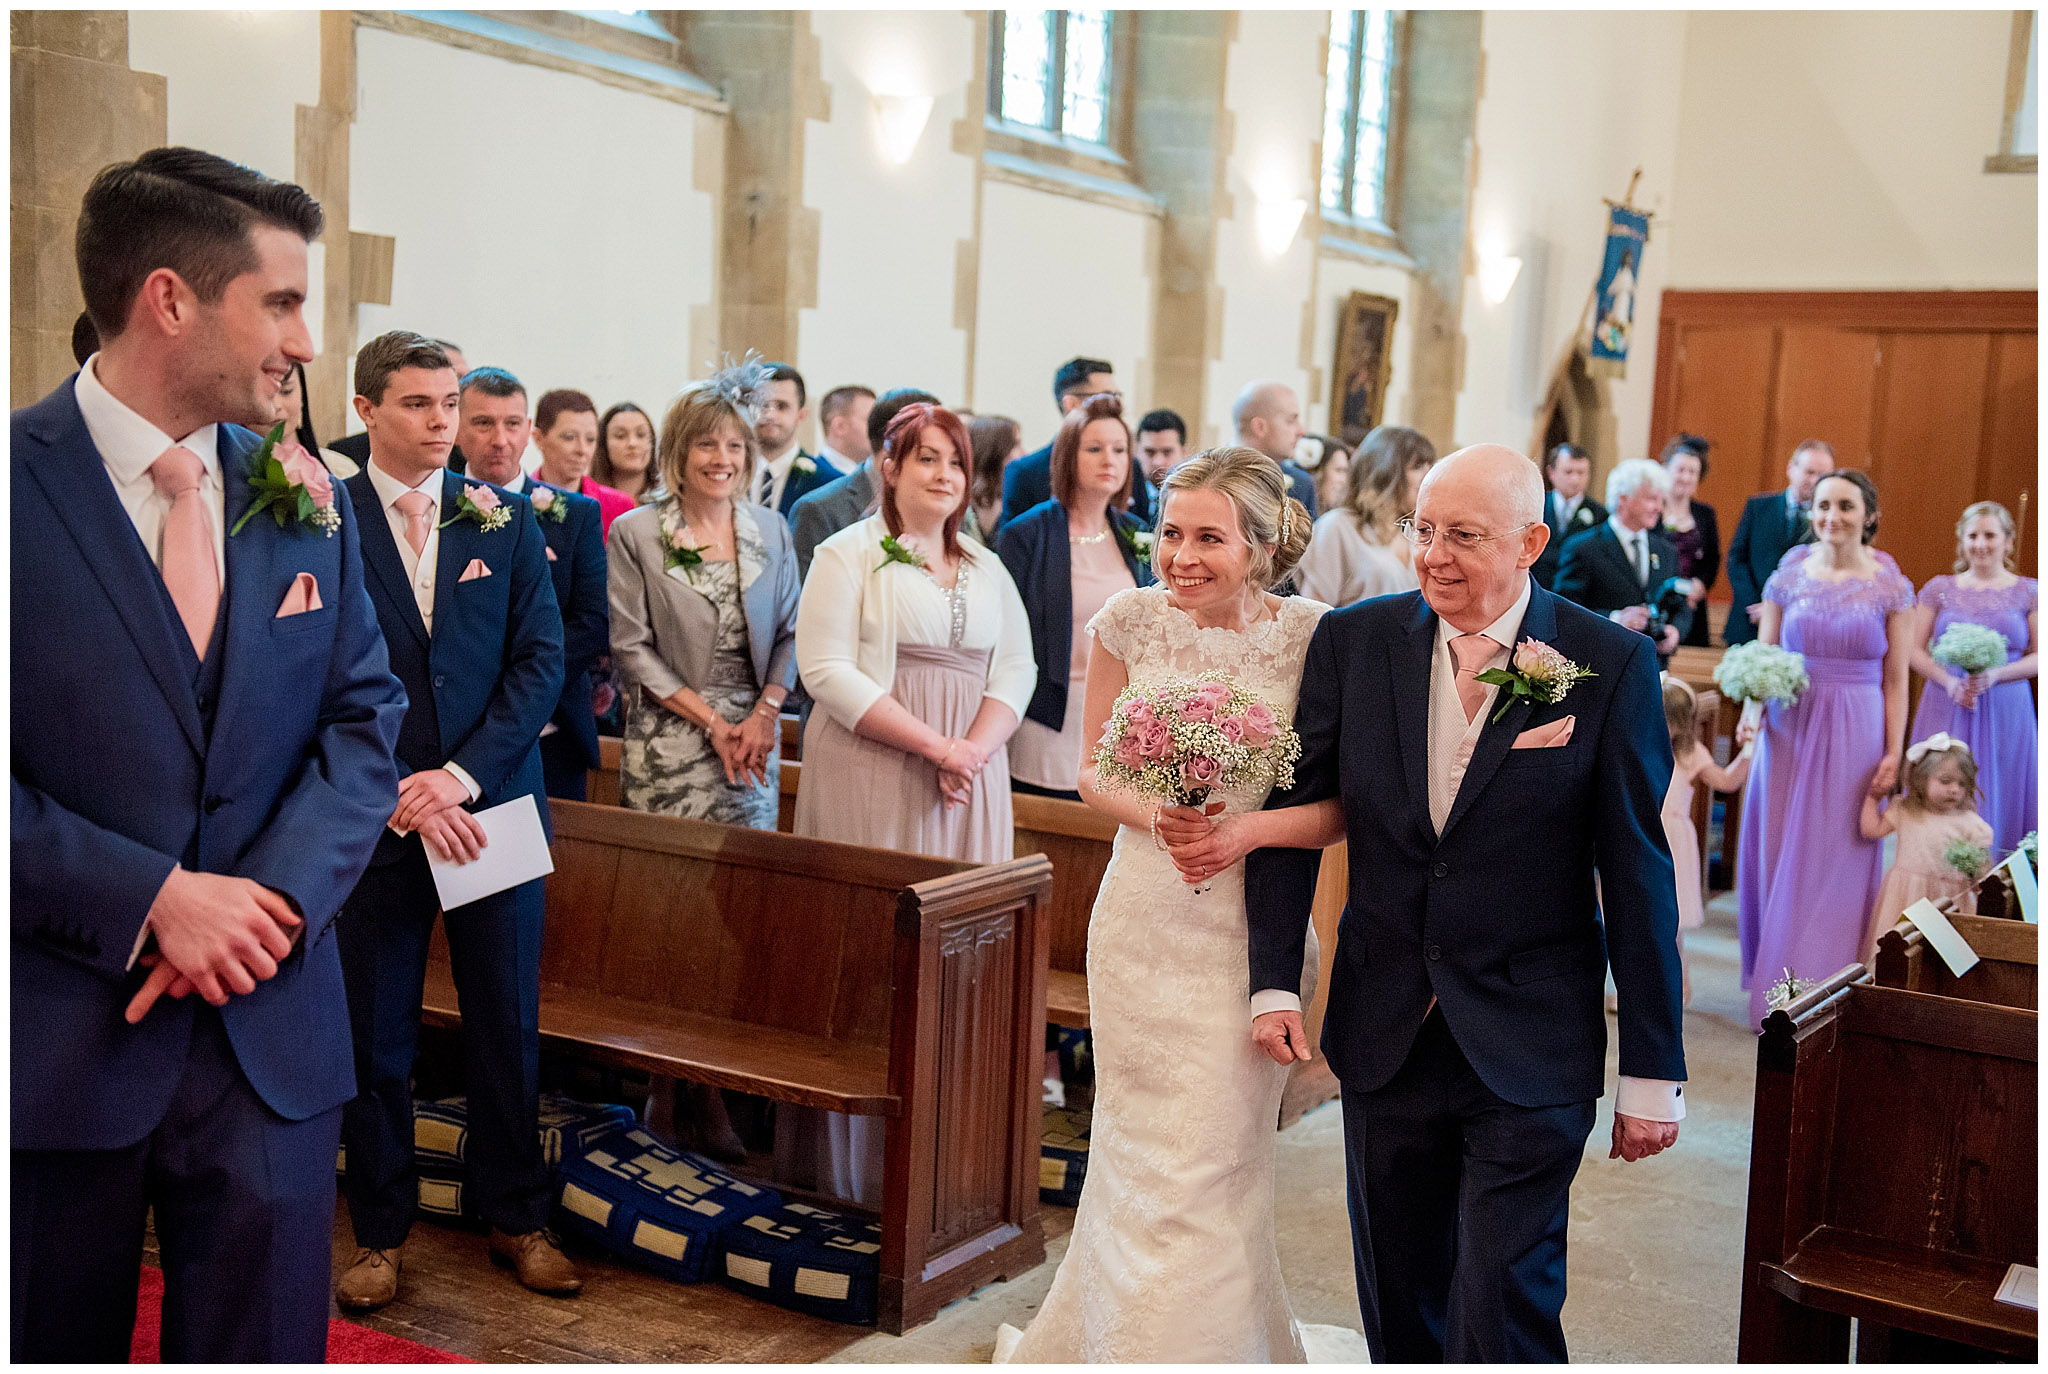 Amy-&-Scott-Boniface-church-and-Itchen-Abbas-Village-Hall-Winchester-Hampshire-wedding-13